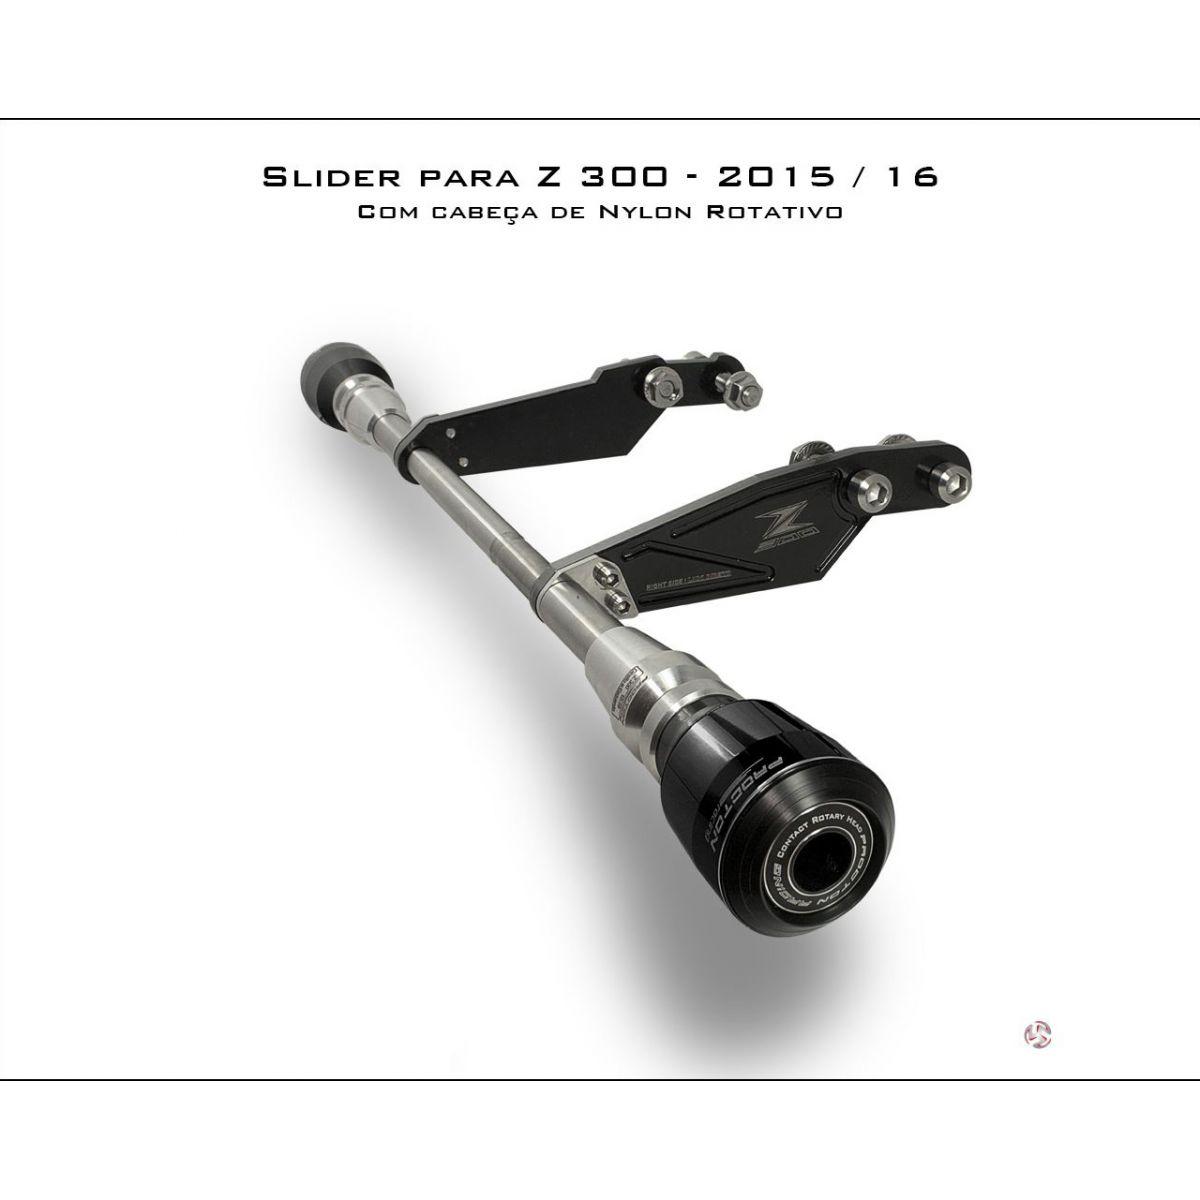 Slider Procton com Amortecimento Kawasaki Z300 15/16  - Planet Bike Shop Moto Acessórios